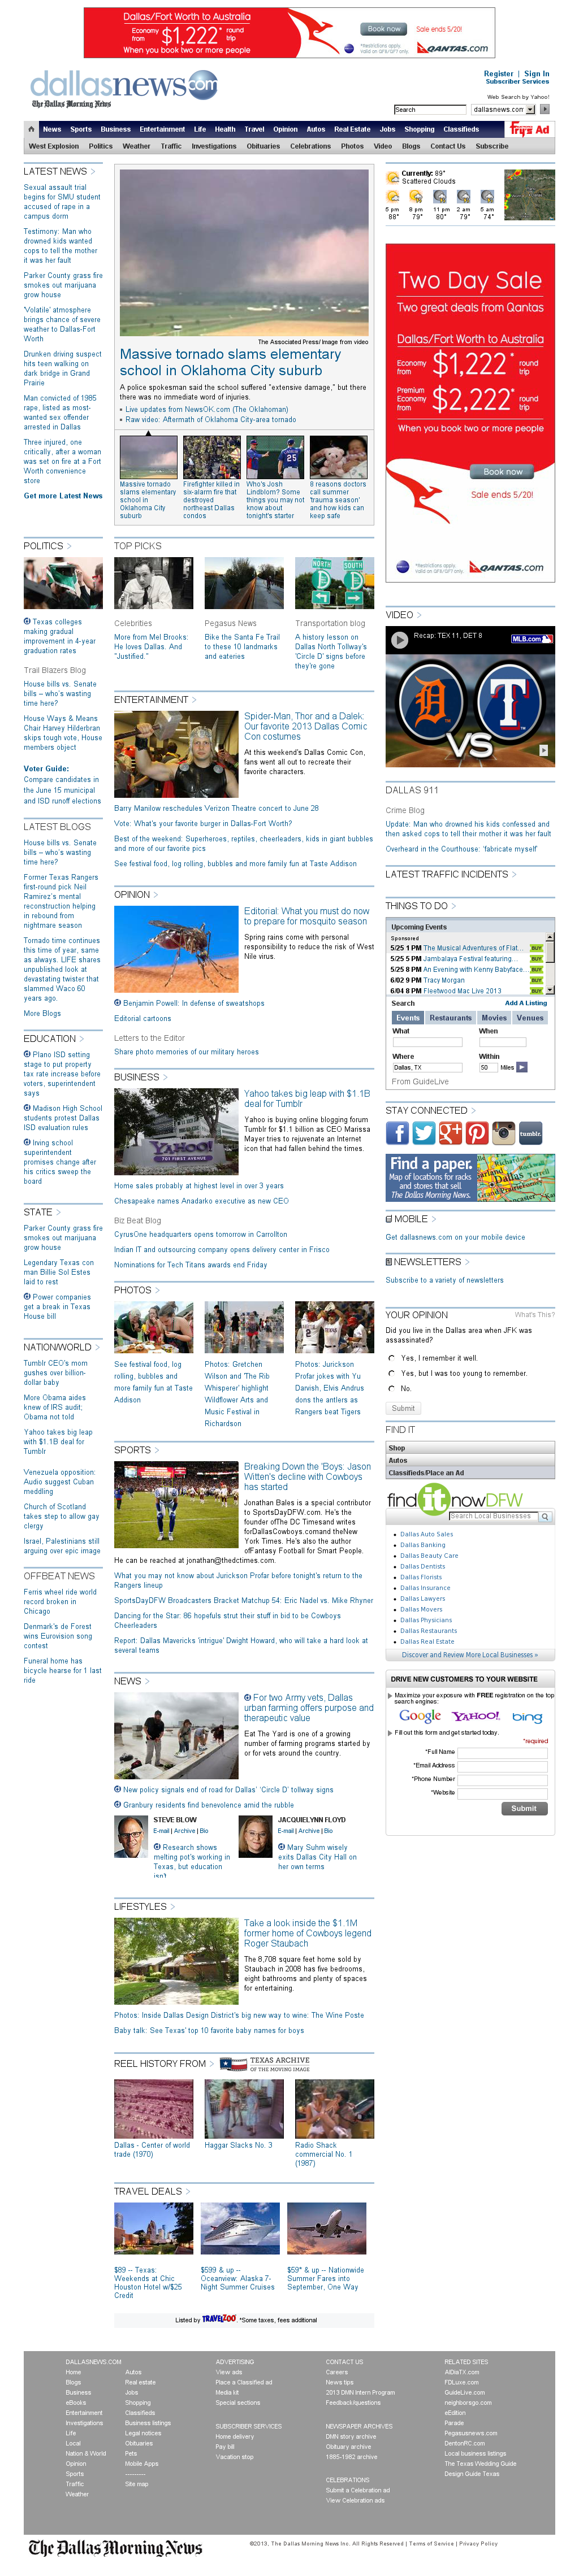 dallasnews.com at Monday May 20, 2013, 10:04 p.m. UTC